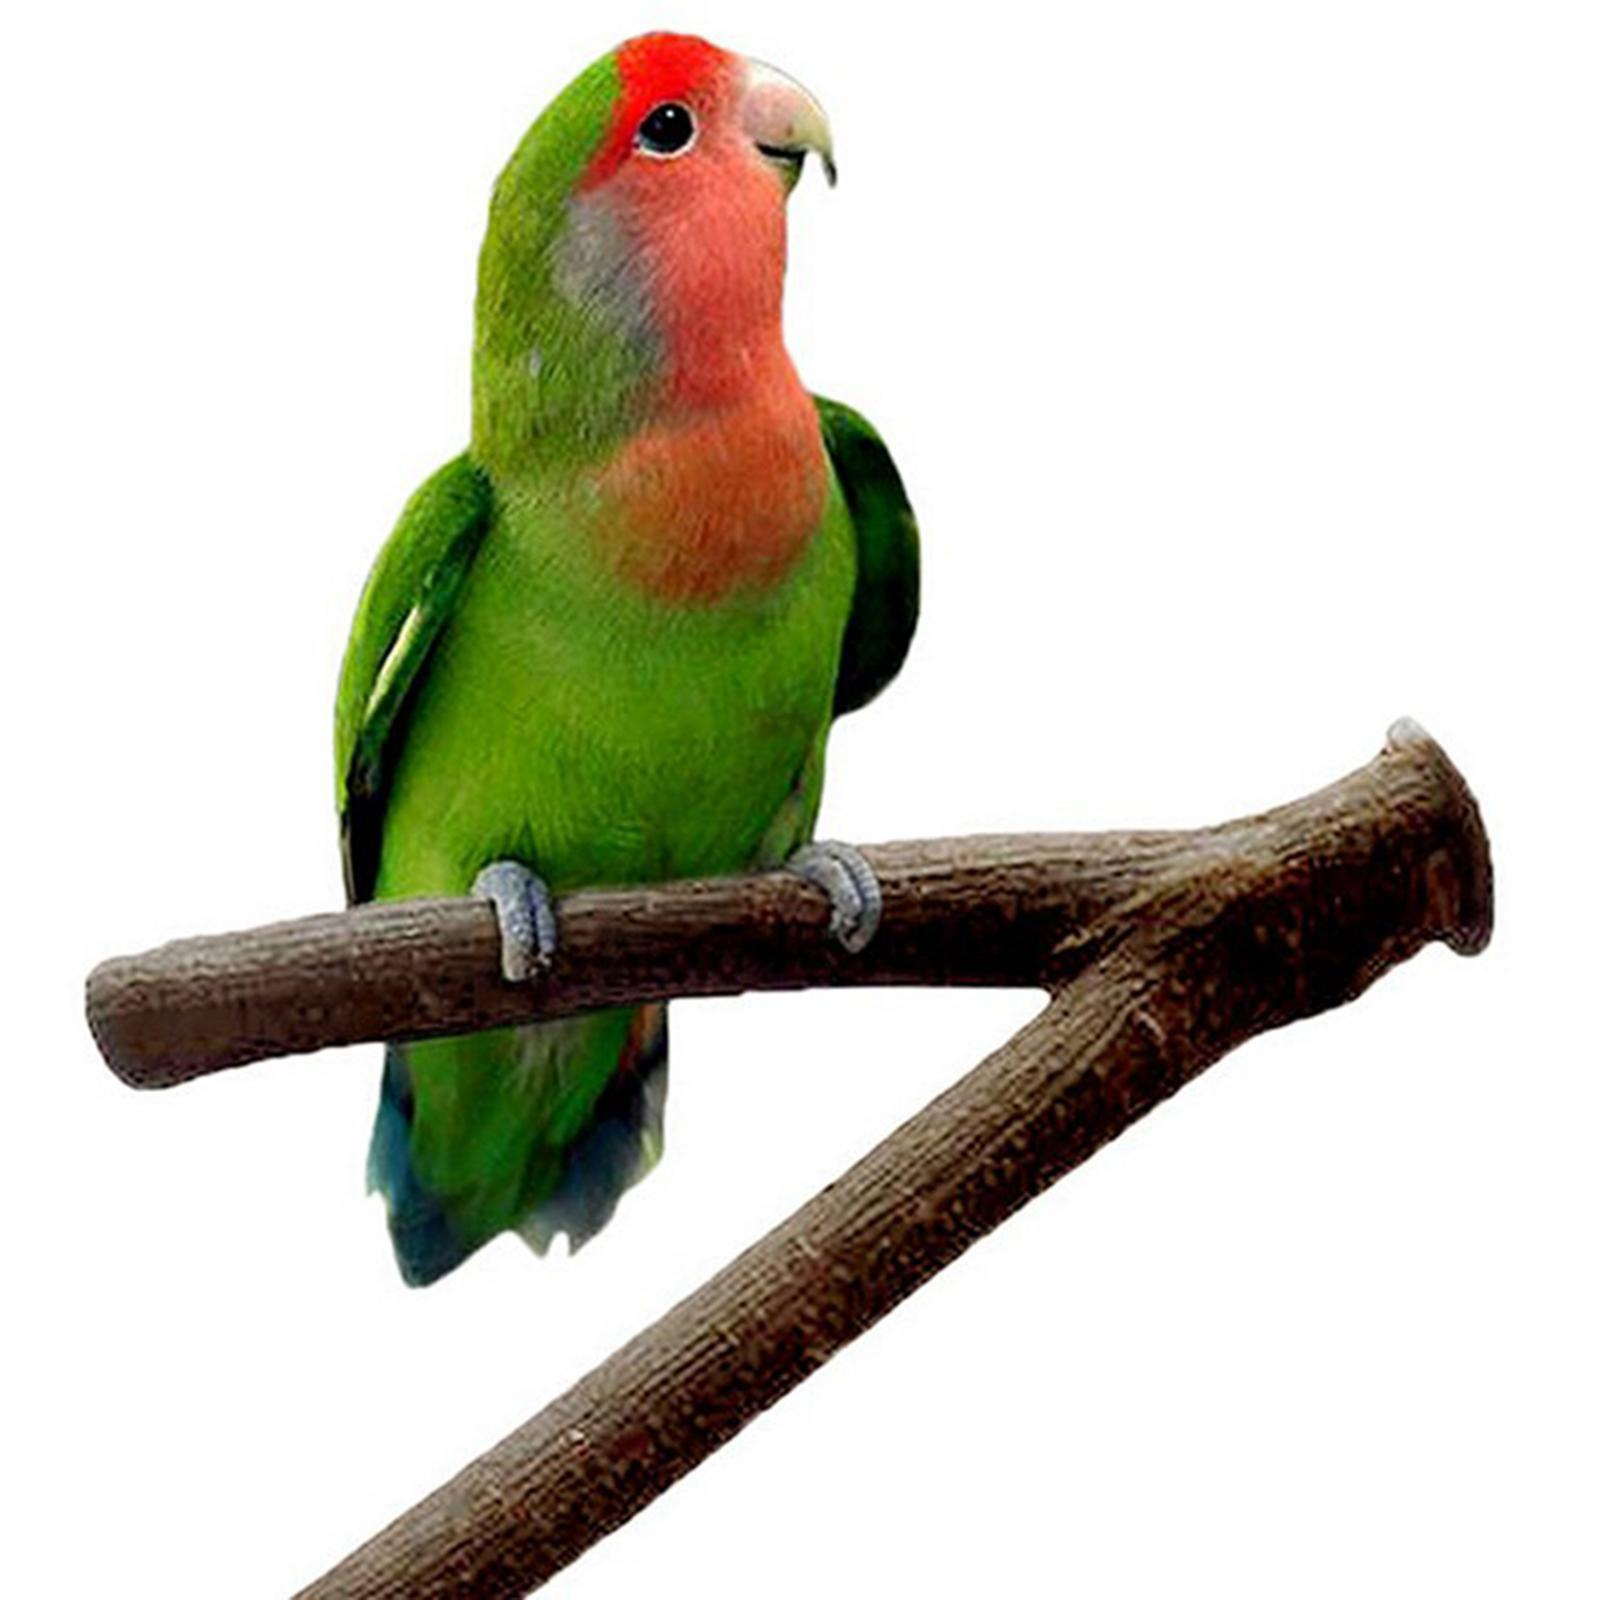 thumbnail 34 - Bird-Perch-Wood-Stand-Bird-Cage-Swing-Branch-for-Parrot-Parakeet-Cockatiel